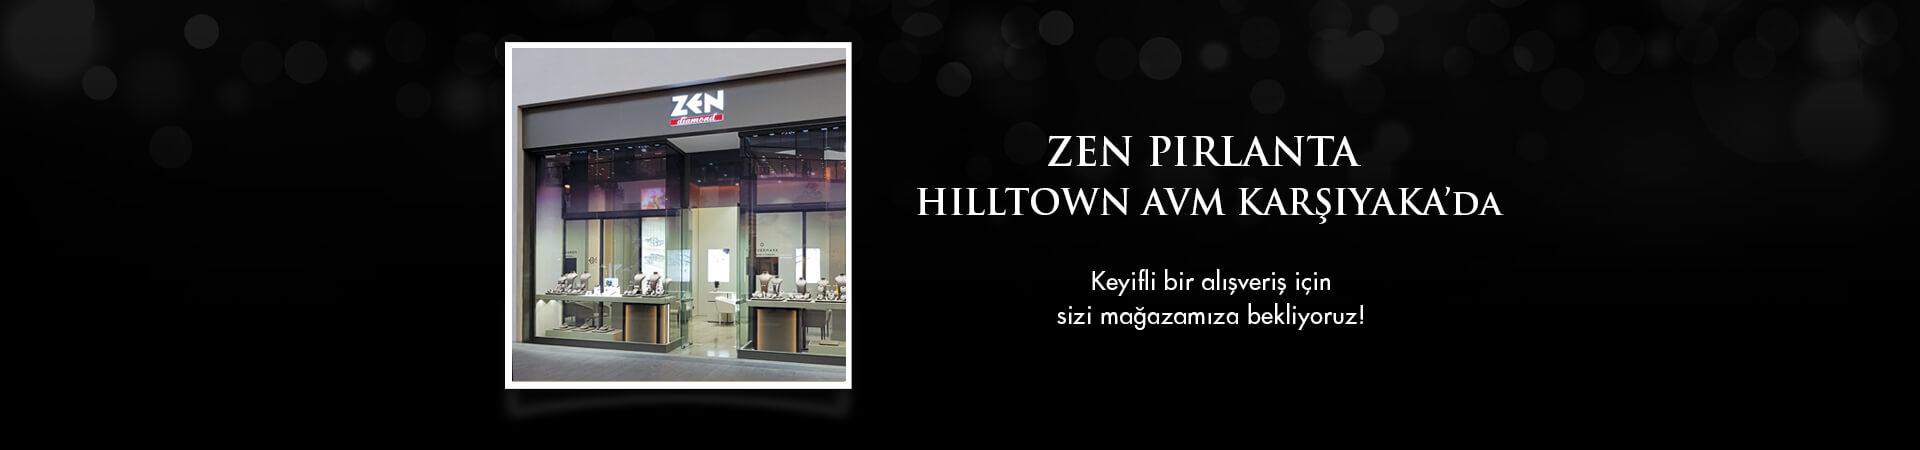 İzmir Hilltown Mağaza açıldı